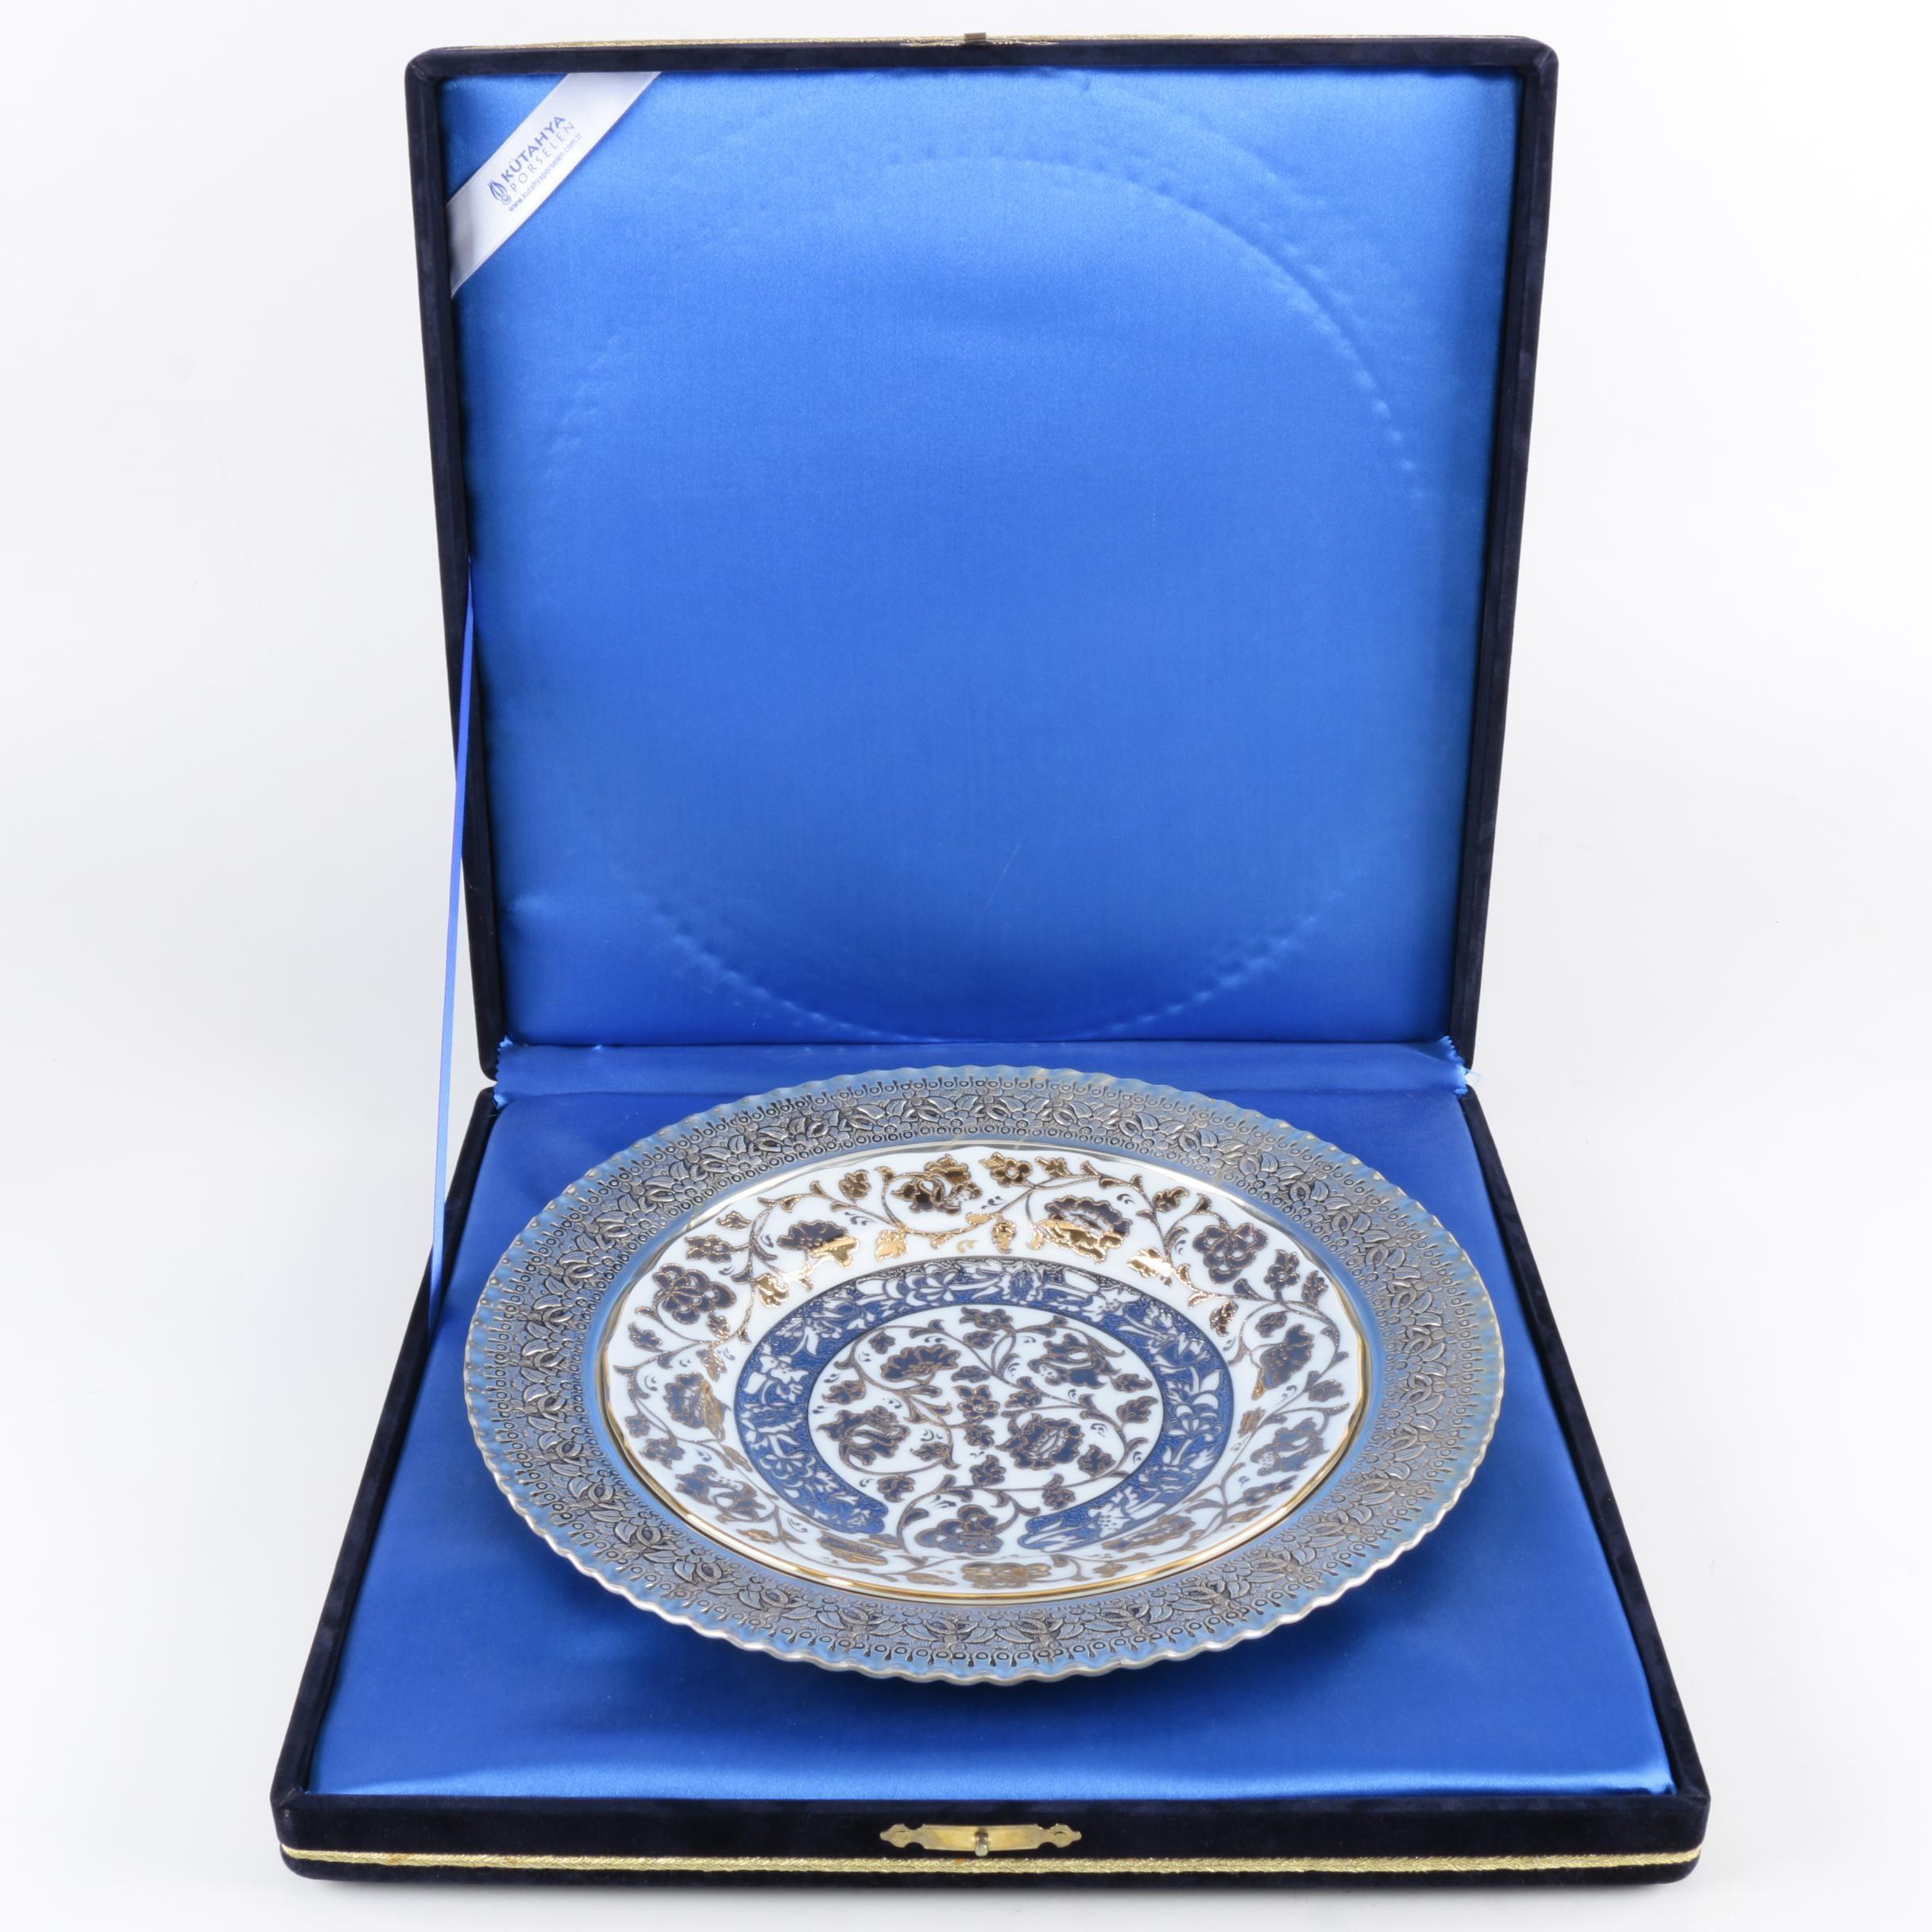 Turkish Hand-Painted Kütahya Porselen Plate